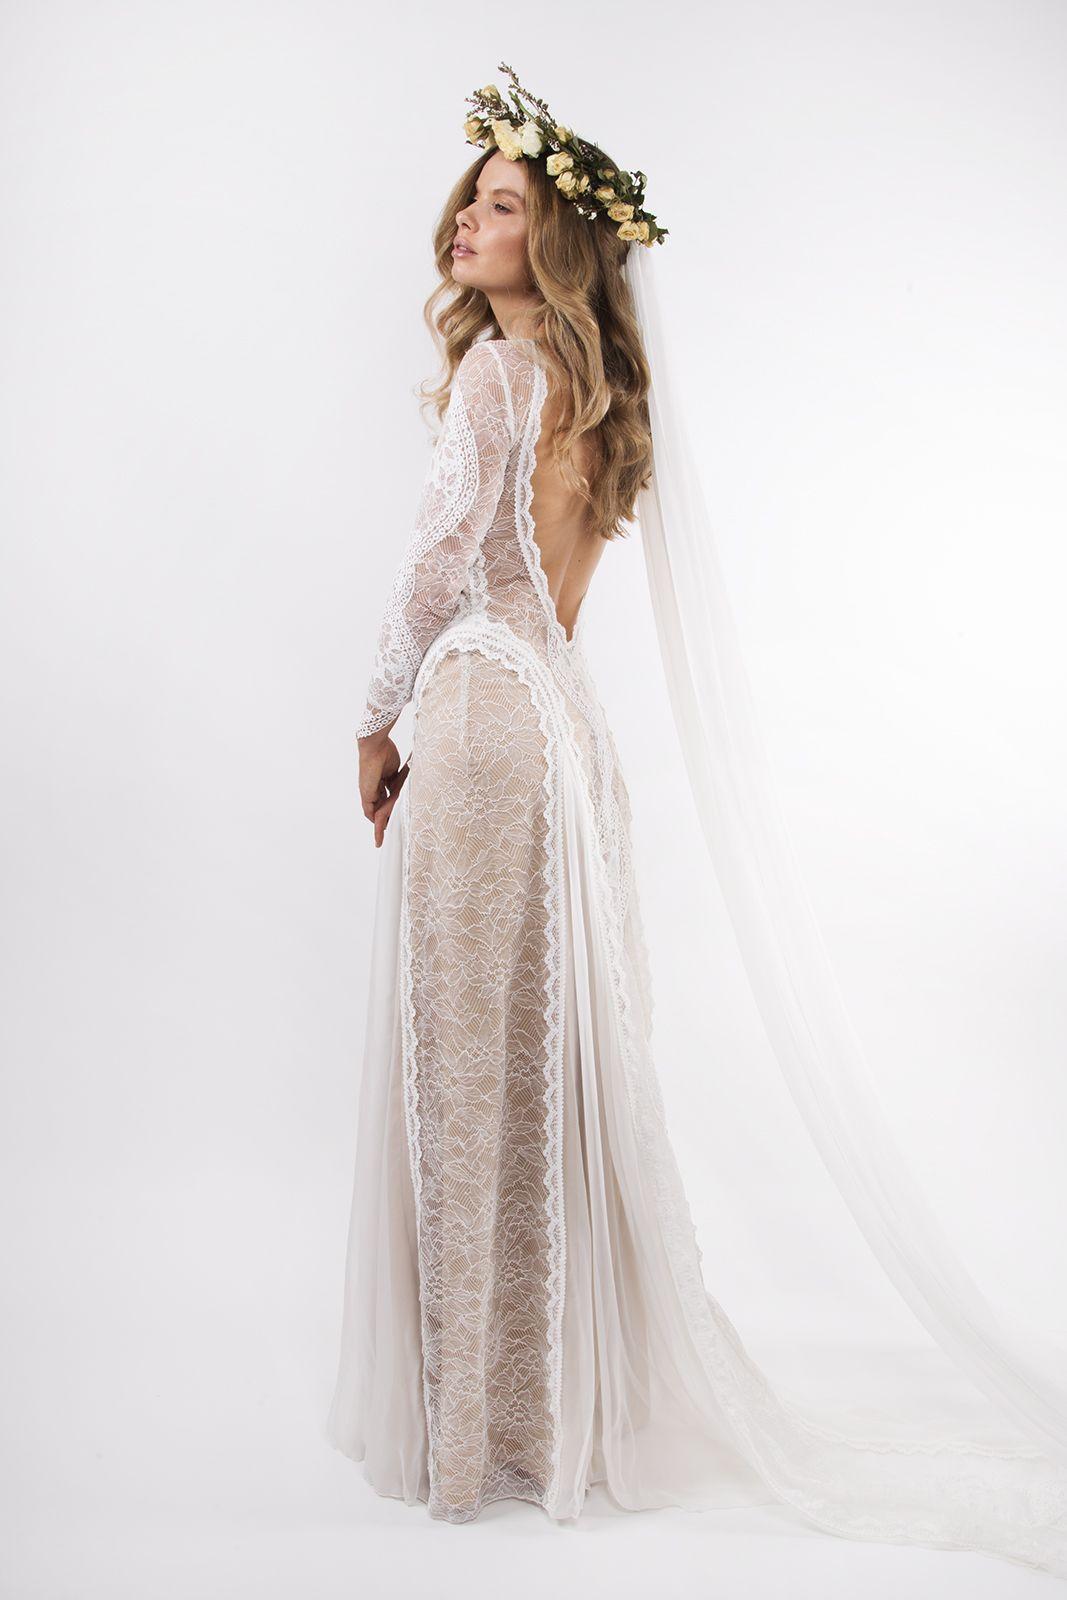 New Grace Loves Lace Inca Wedding Dress Size 8 2 000